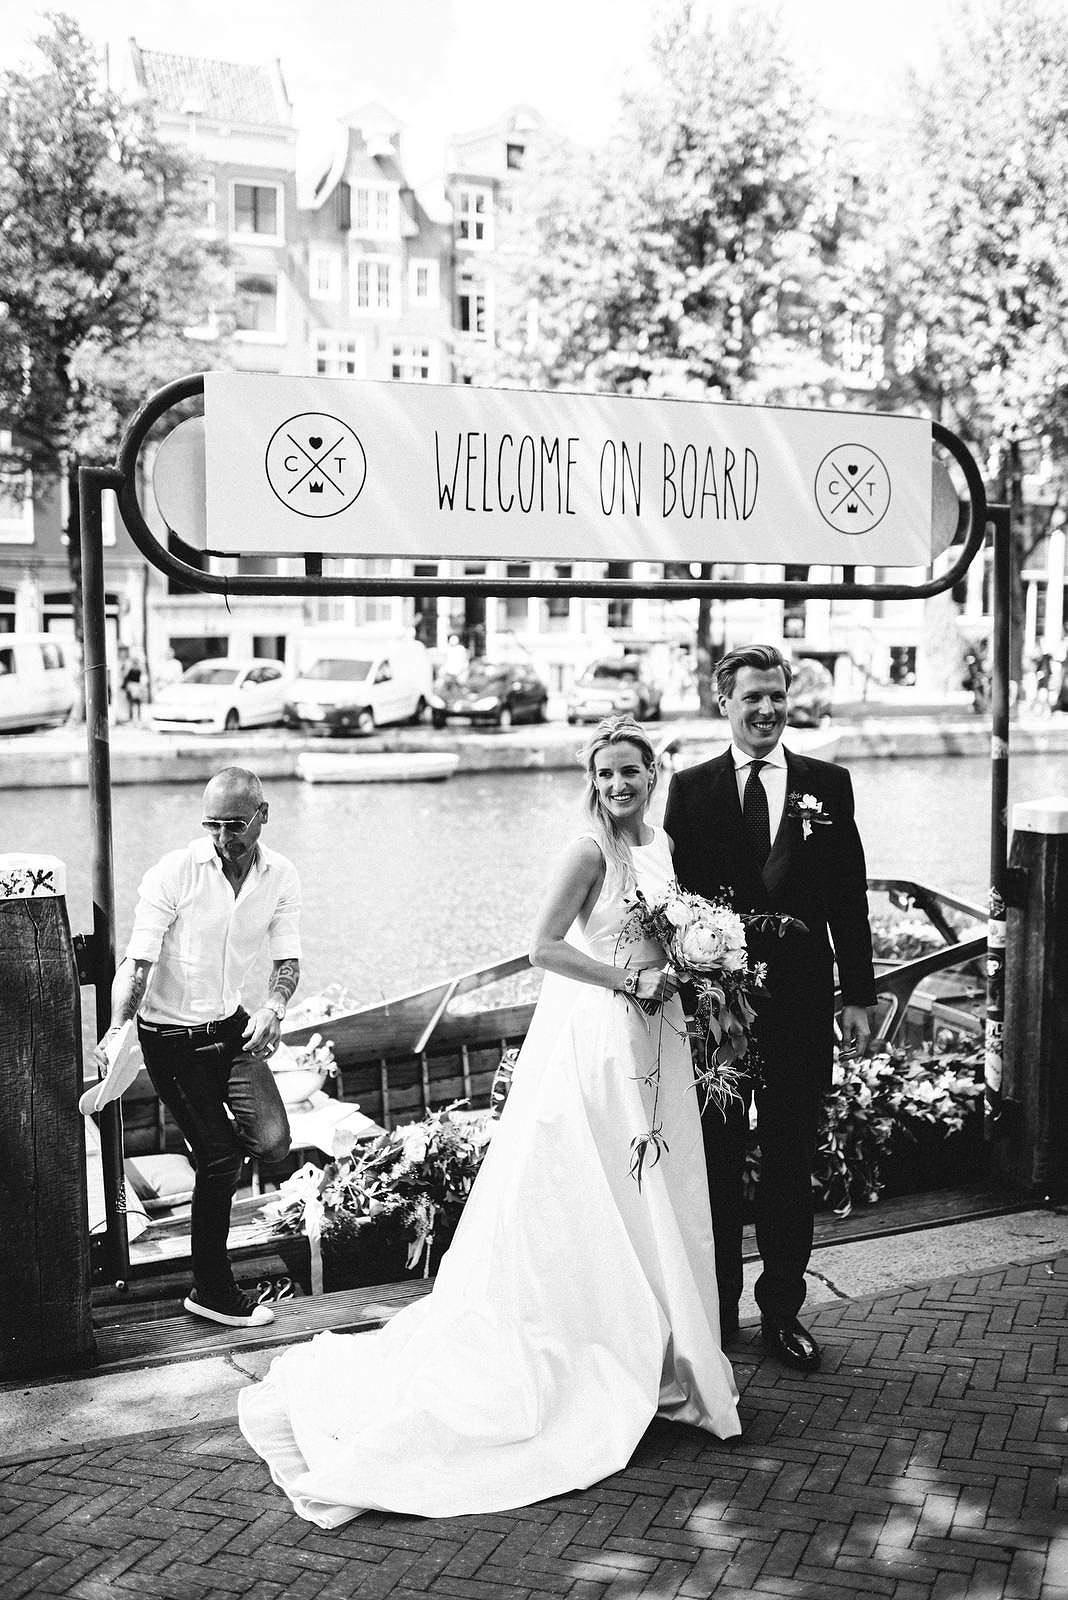 Fotograf Konstanz - Destination Wedding Photographer Amsterdam 049 - Destination Wedding Amsterdam  - 158 -